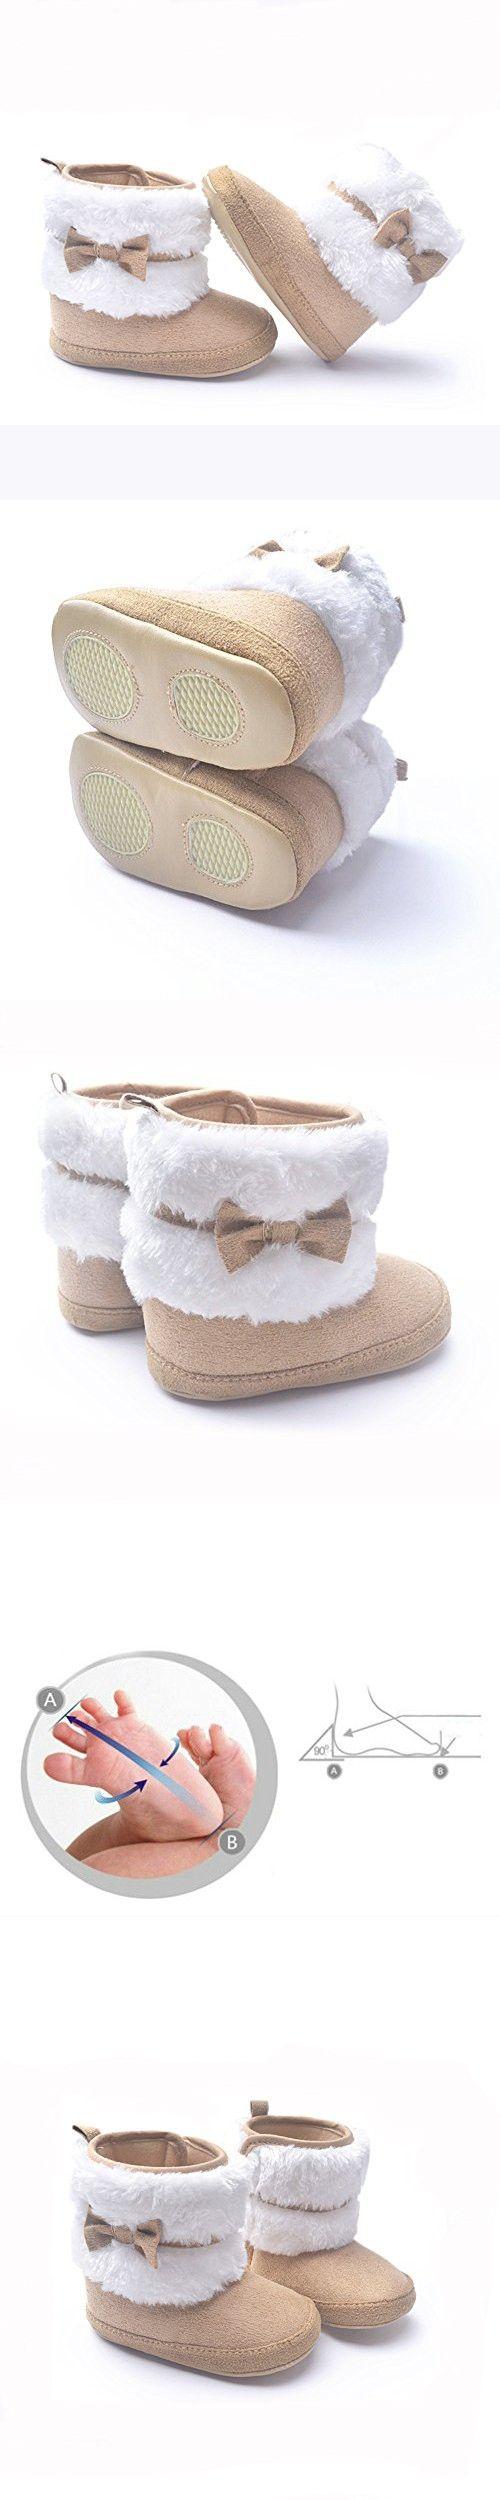 LIVEBOX Baby Girls' Premium Soft Sole Bow Anti-Slip Mid Calf Warm Winter Infant Prewalker Toddler Snow Boots (M: 6~12 months, Khaki)